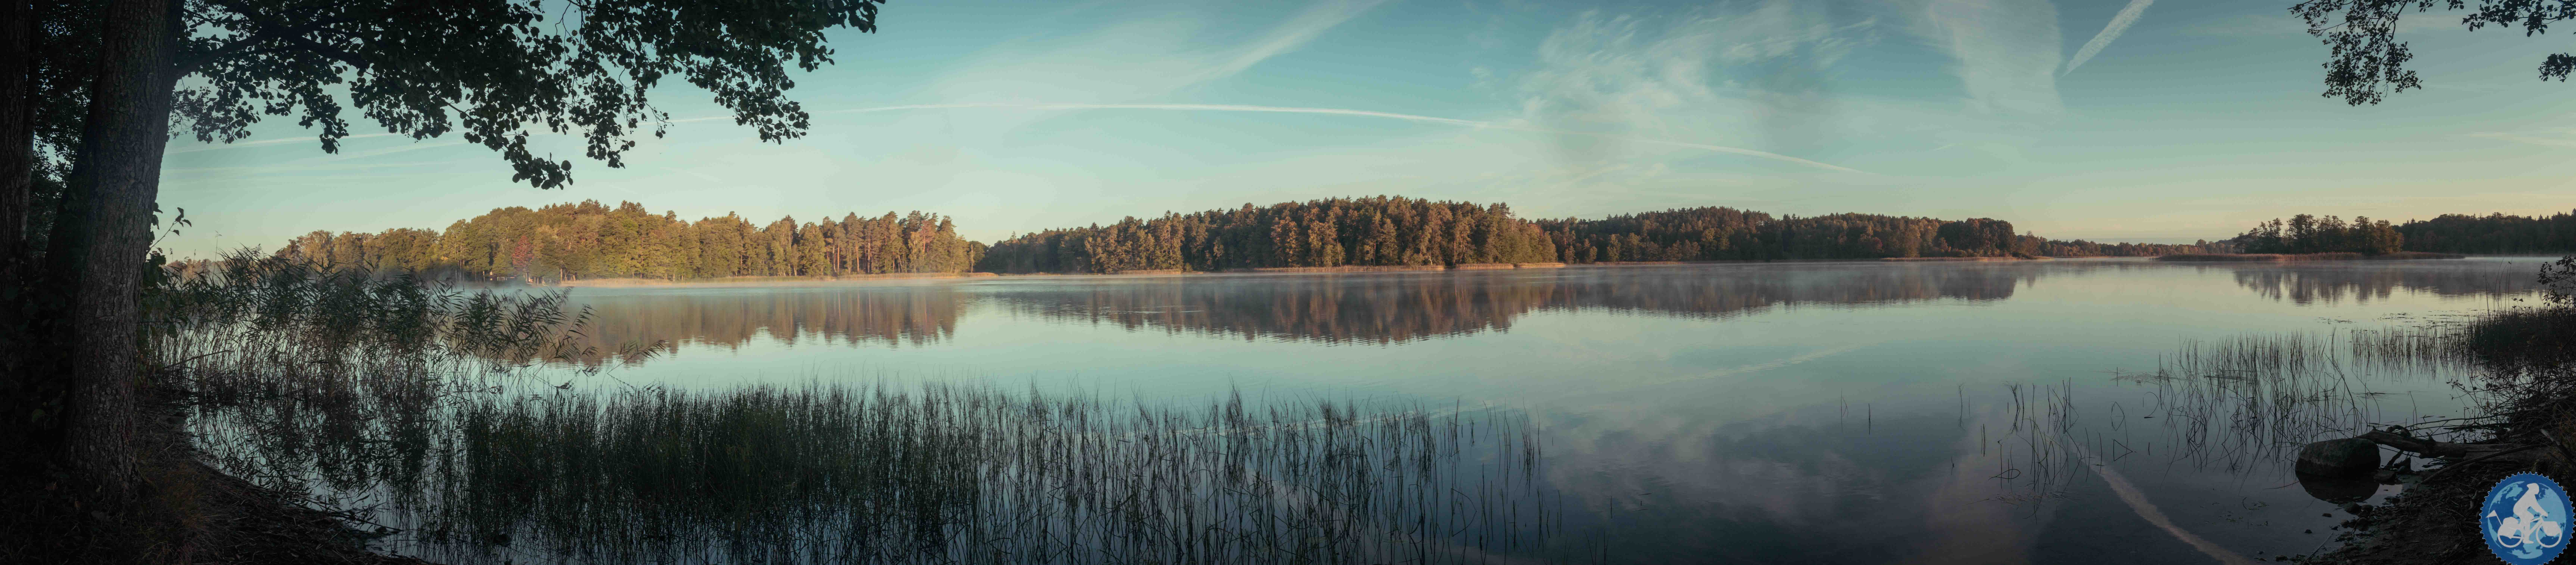 Trakai Campingplatz